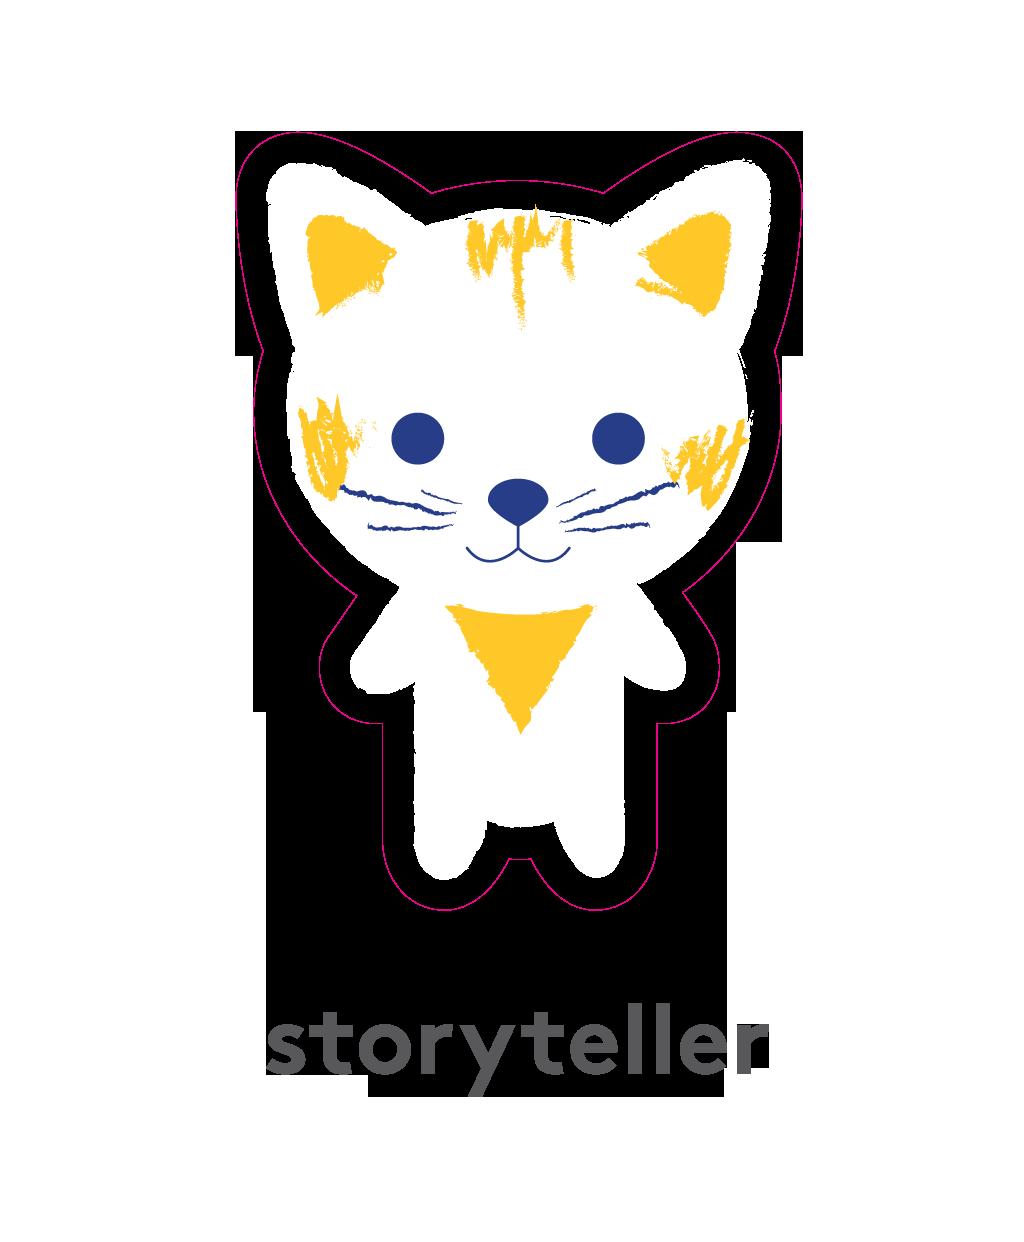 storyteller-stibpencils..png